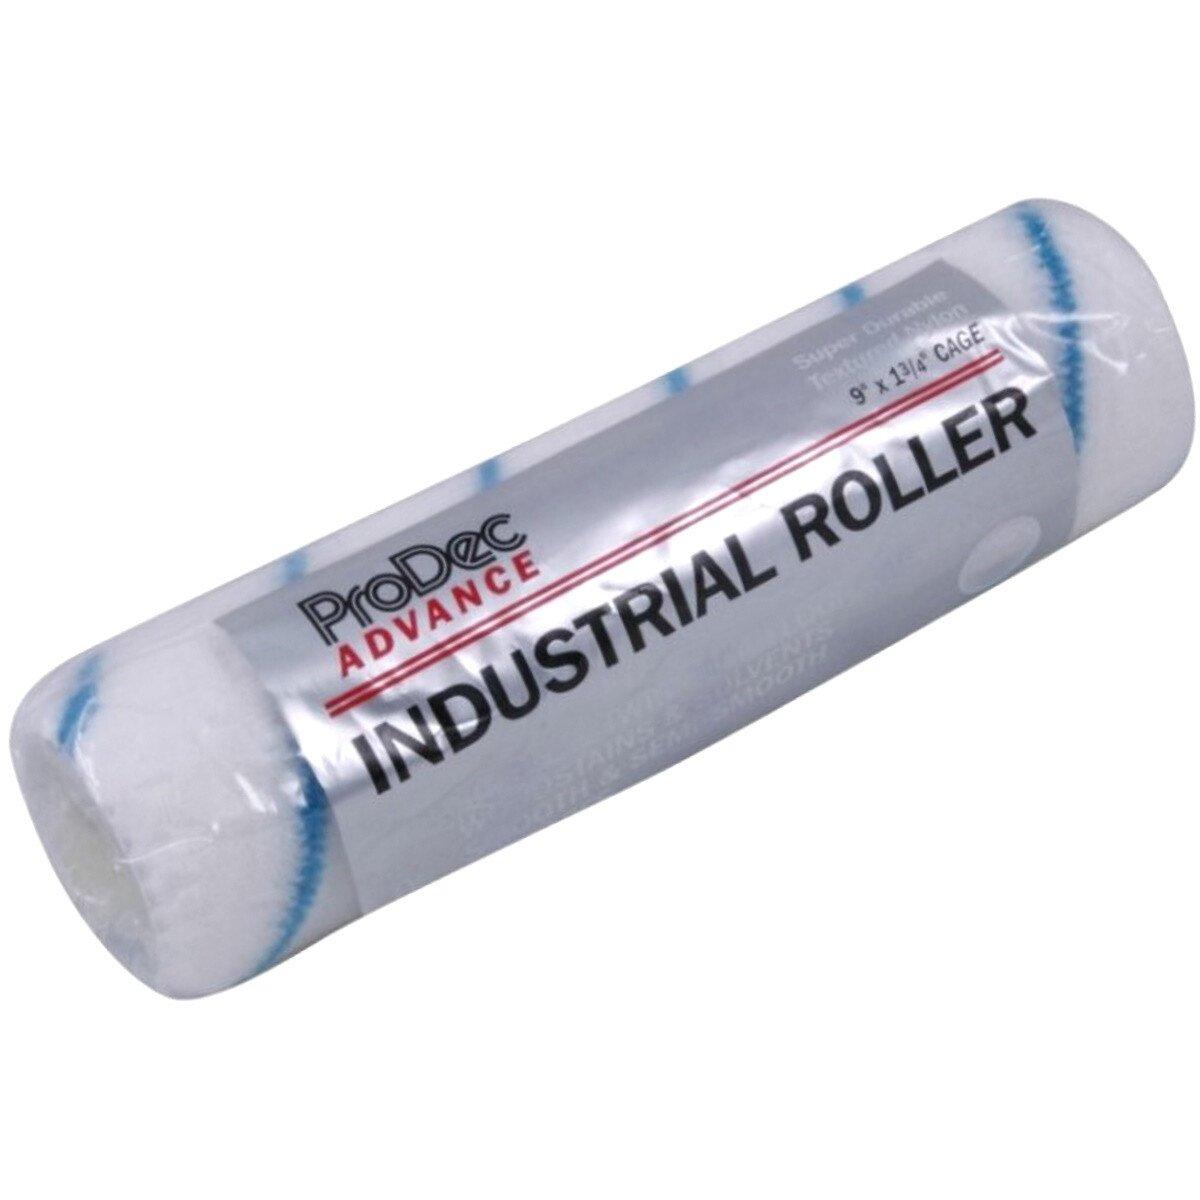 "ProDec ARRE023 9"" x 1.75"" Solvent Resistant Industrial Roller Refill"